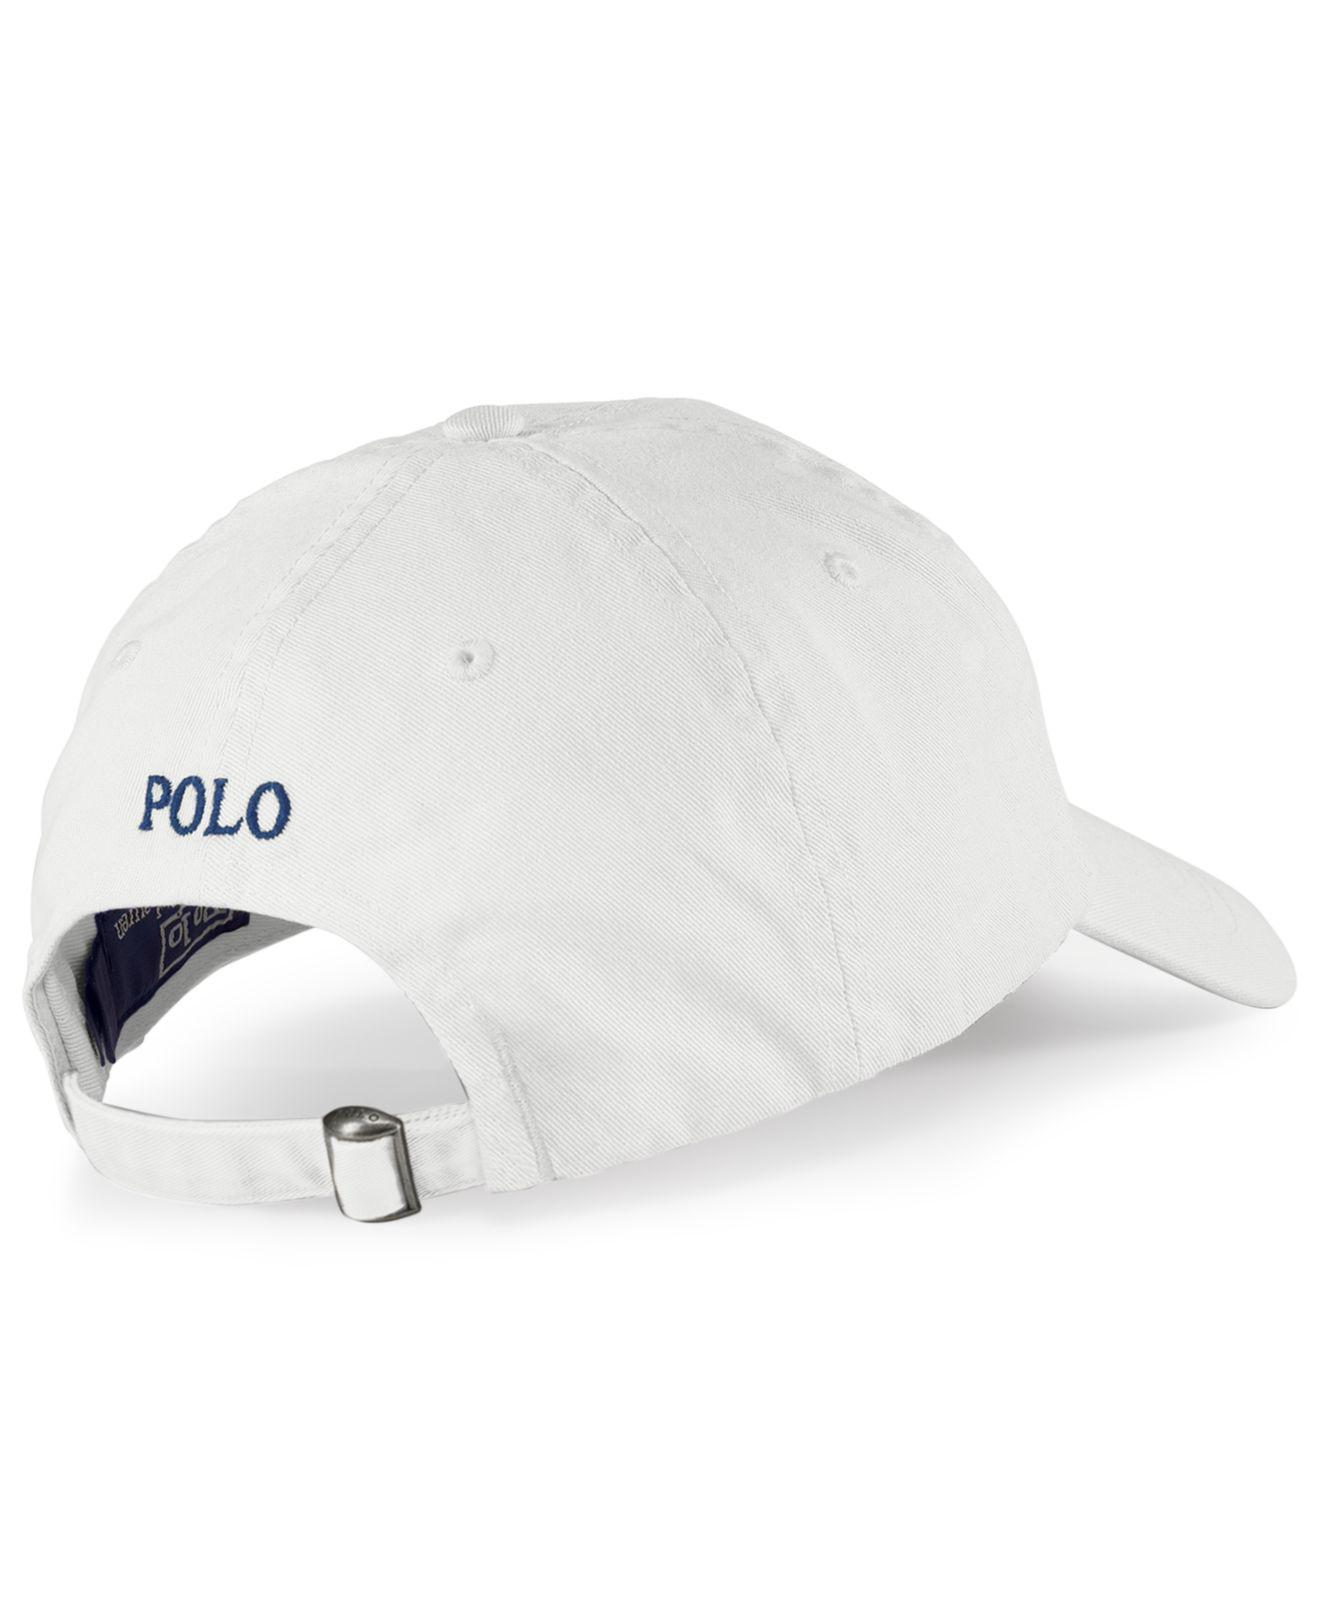 fe778c14 Polo Ralph Lauren Classic Sport Cap in White for Men - Save 28% - Lyst